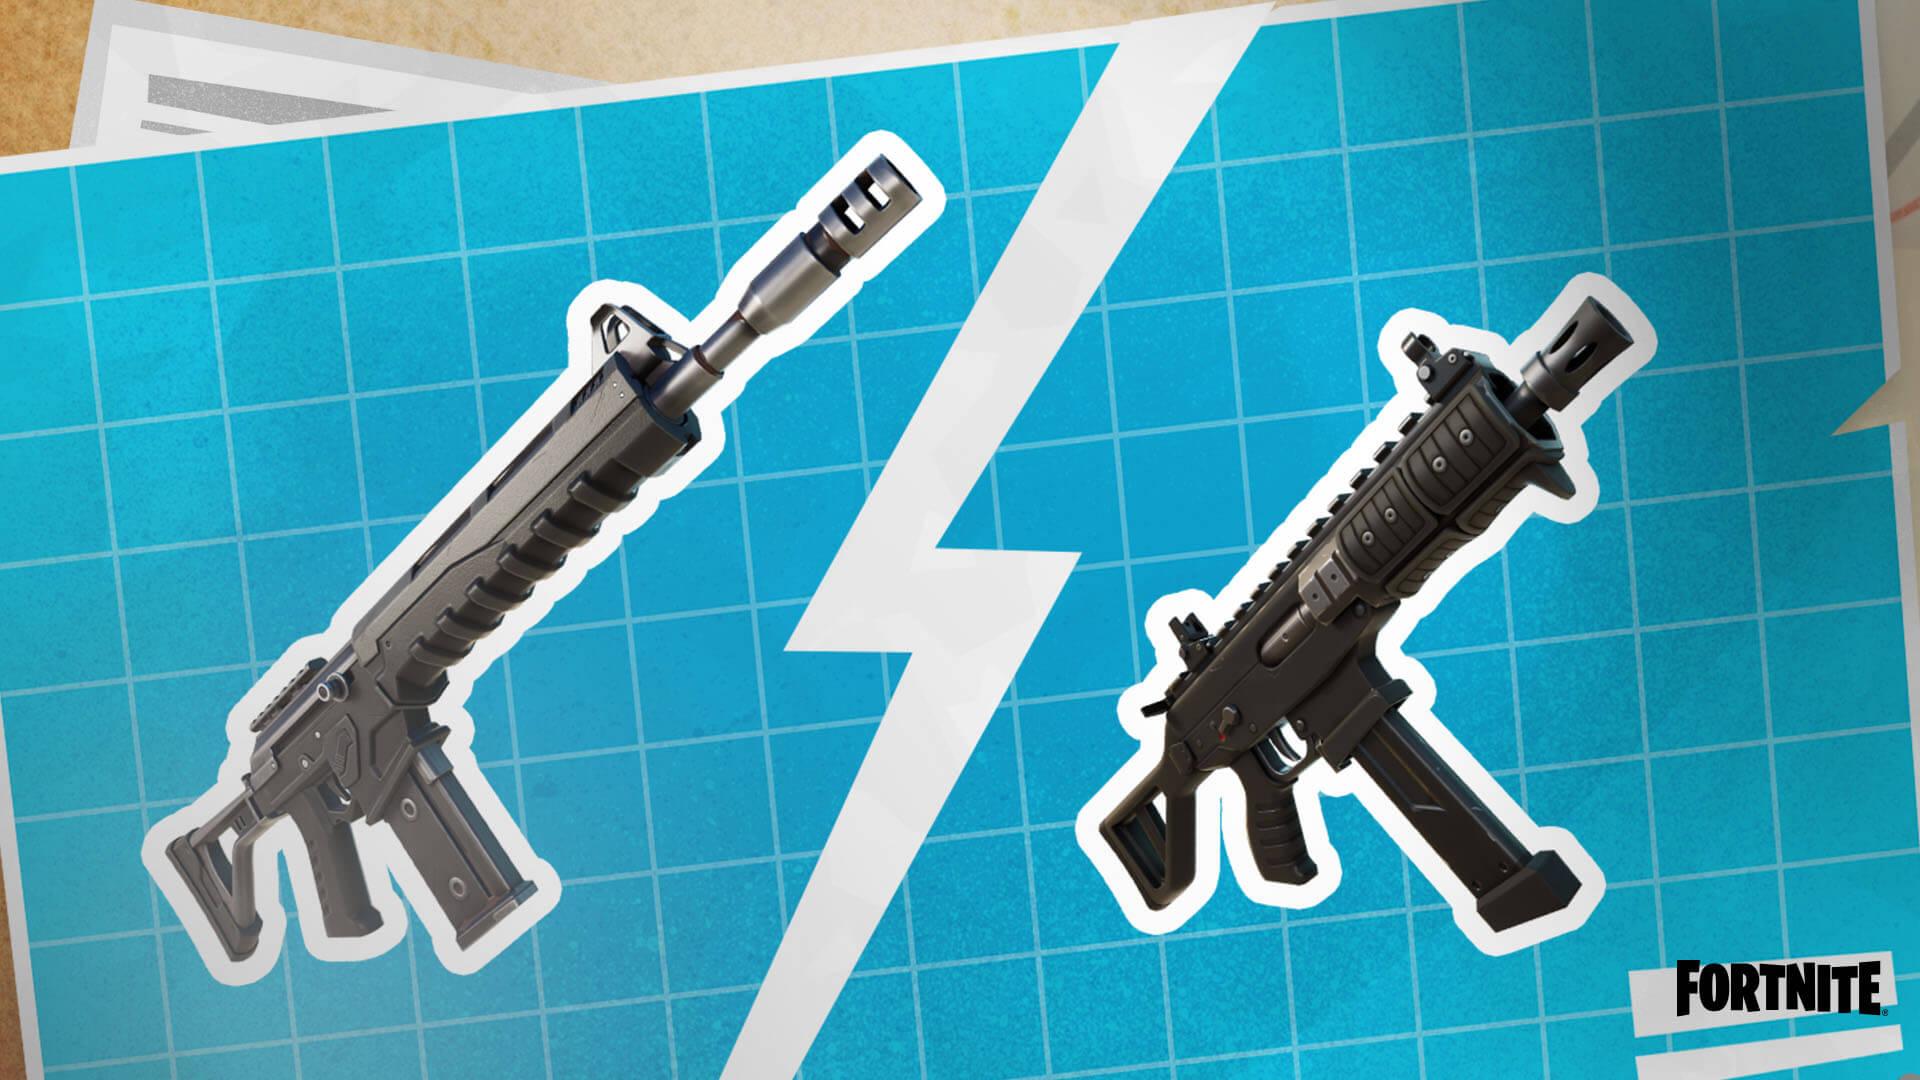 Fortnite Combat Assault Rifle vs. Combat SMG